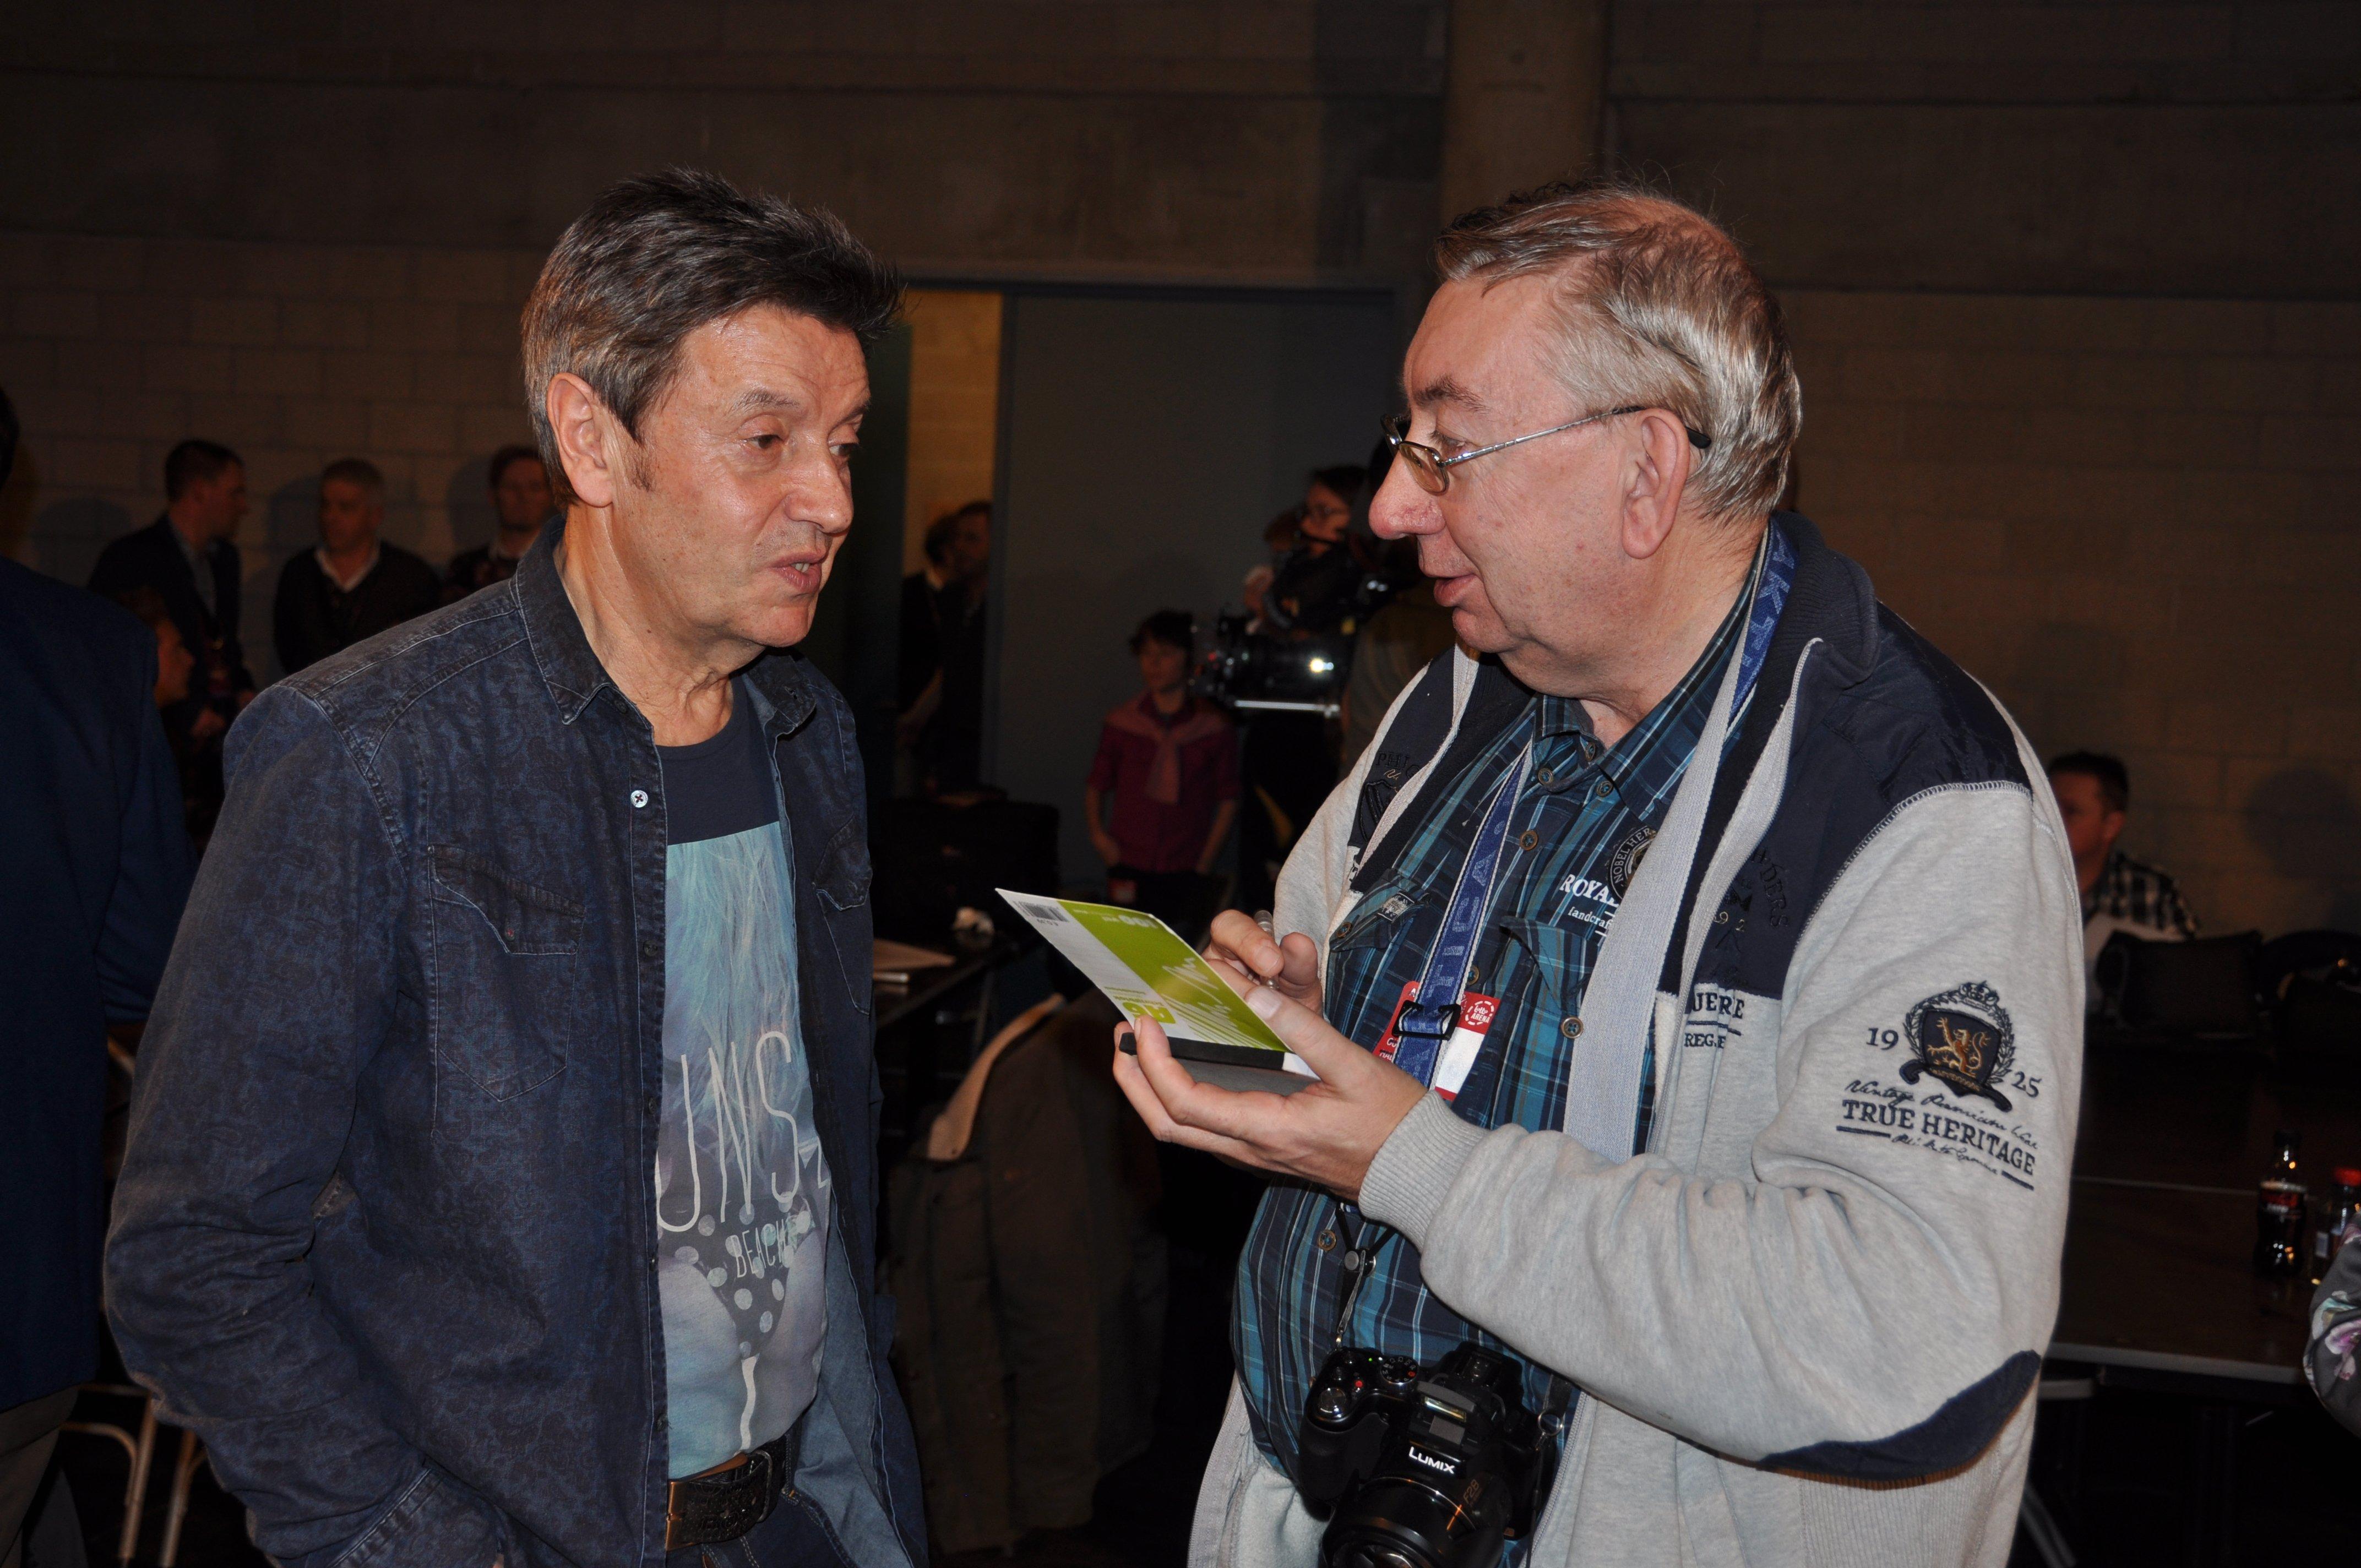 willy Sommers en Swoop maken affiche Schlagerfestival 2018 compleet - DSC 4668